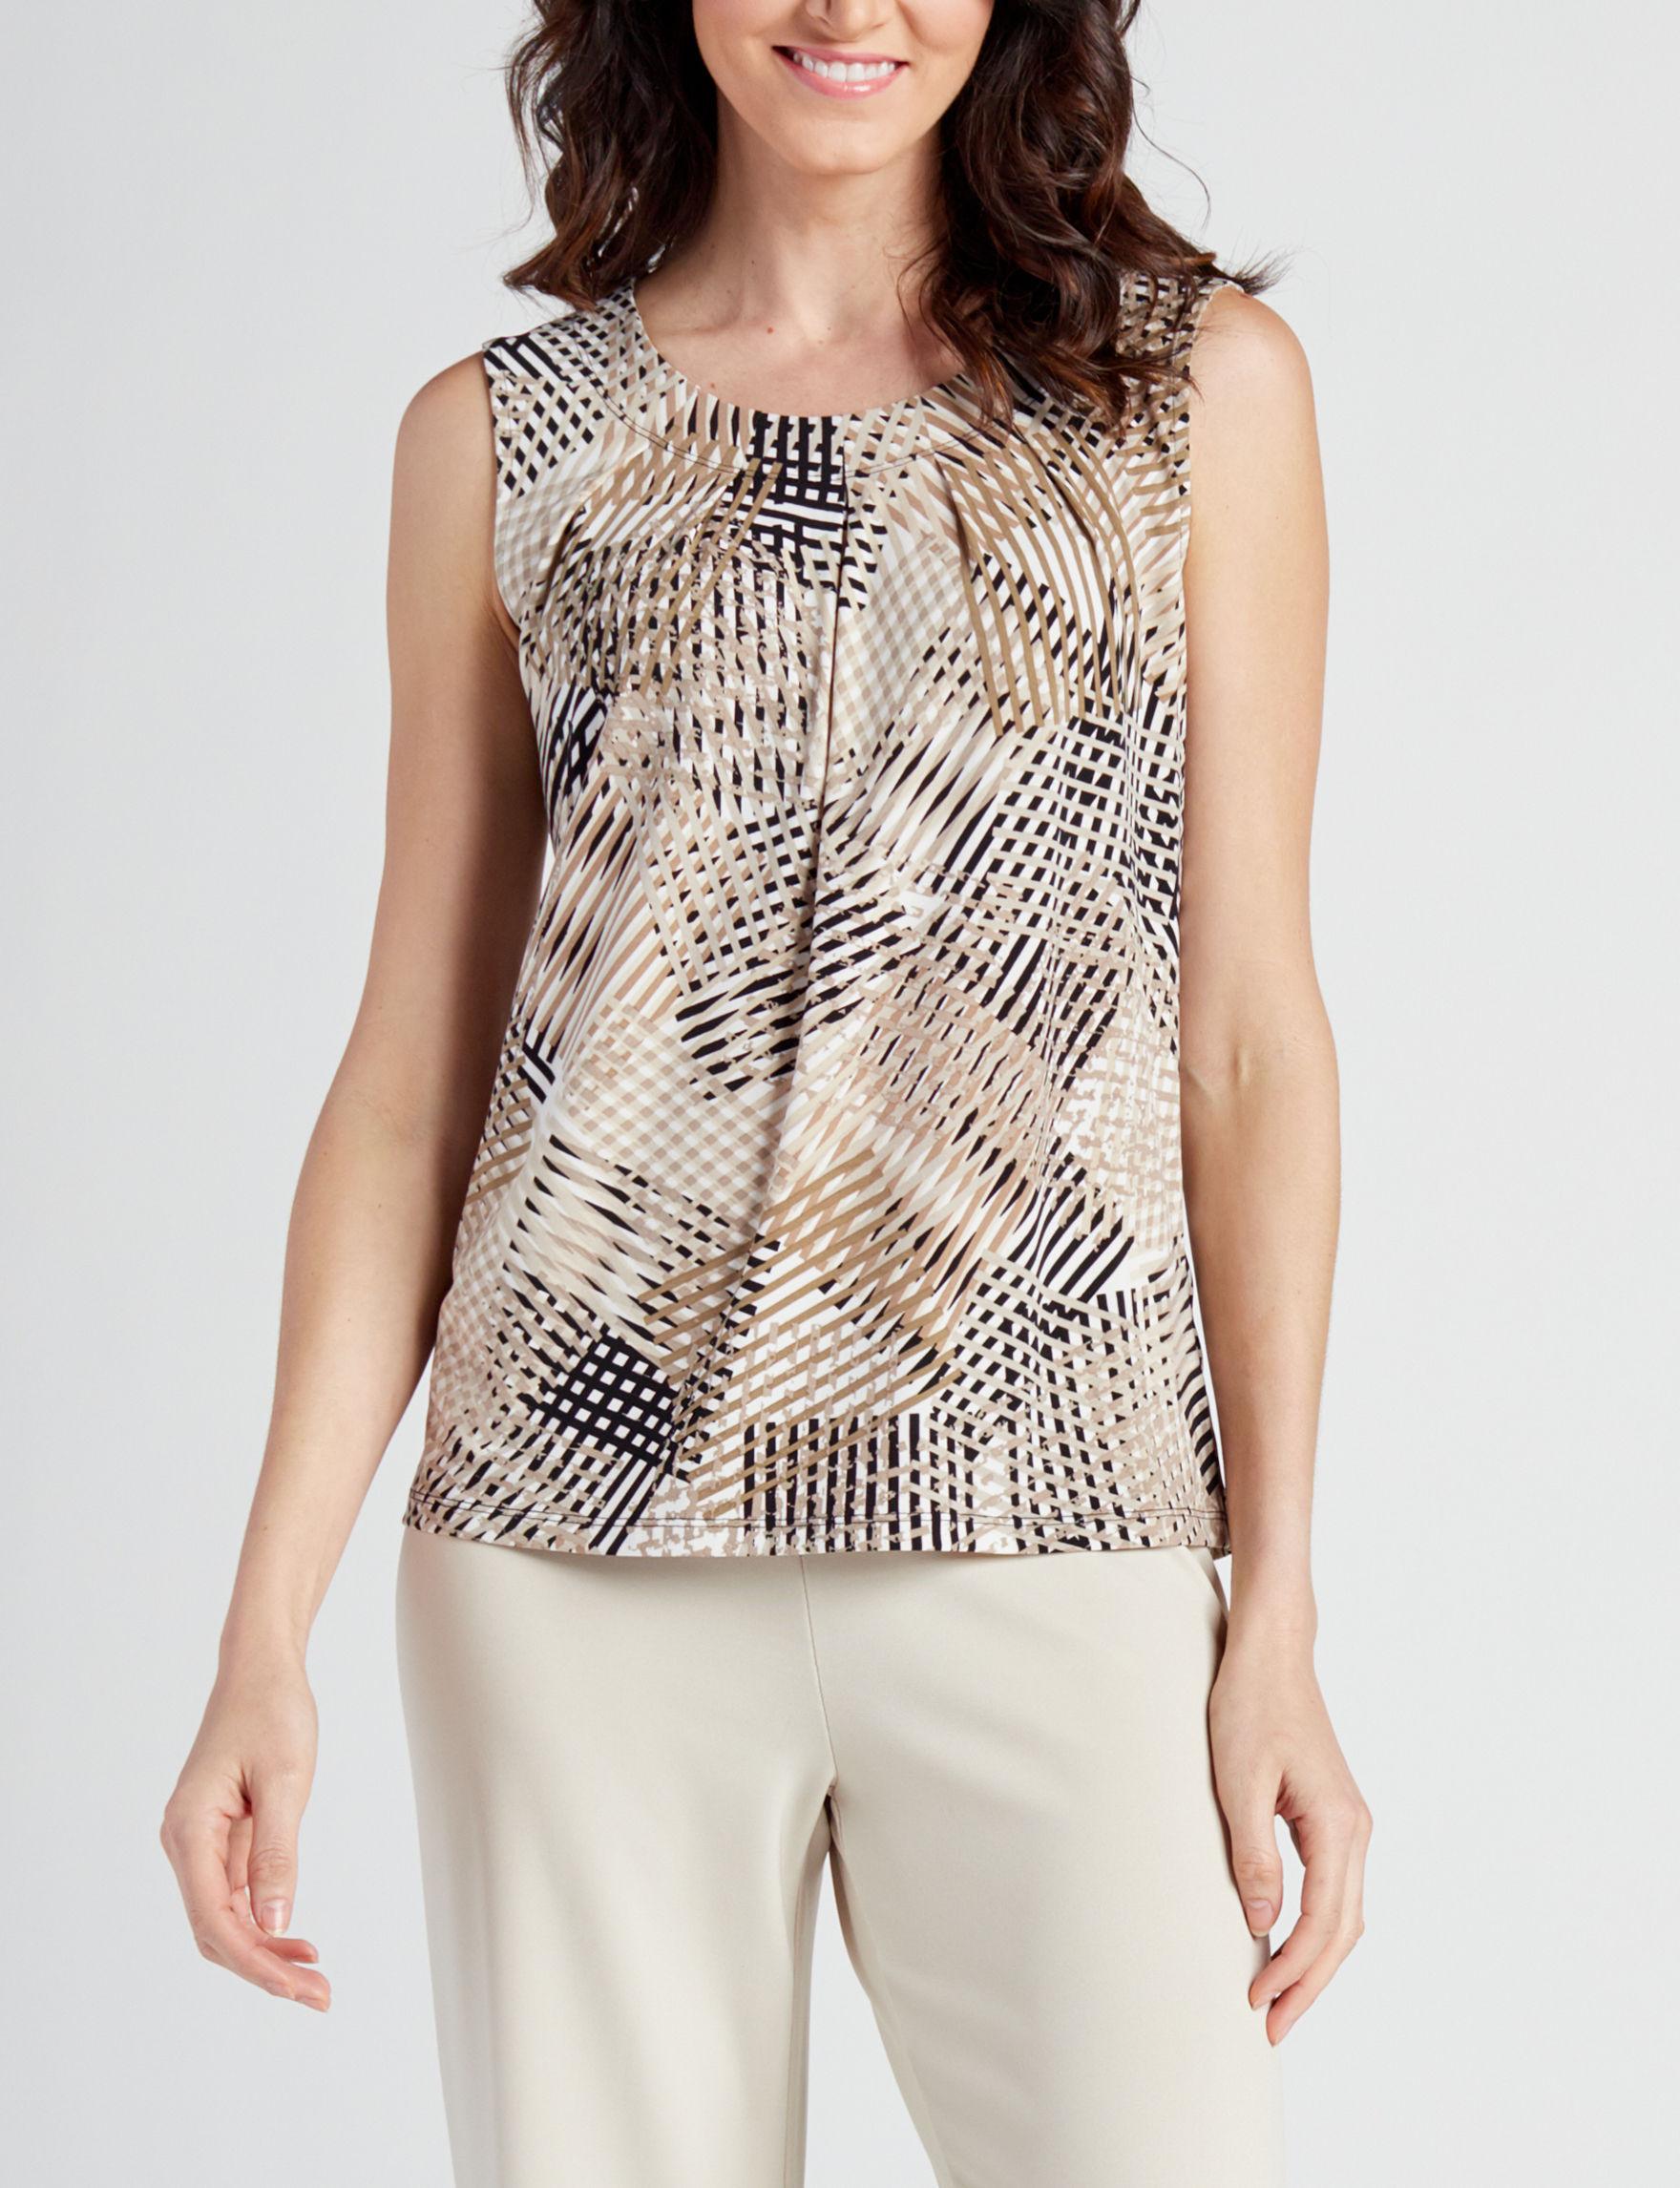 Kasper Brown Multi Shirts & Blouses